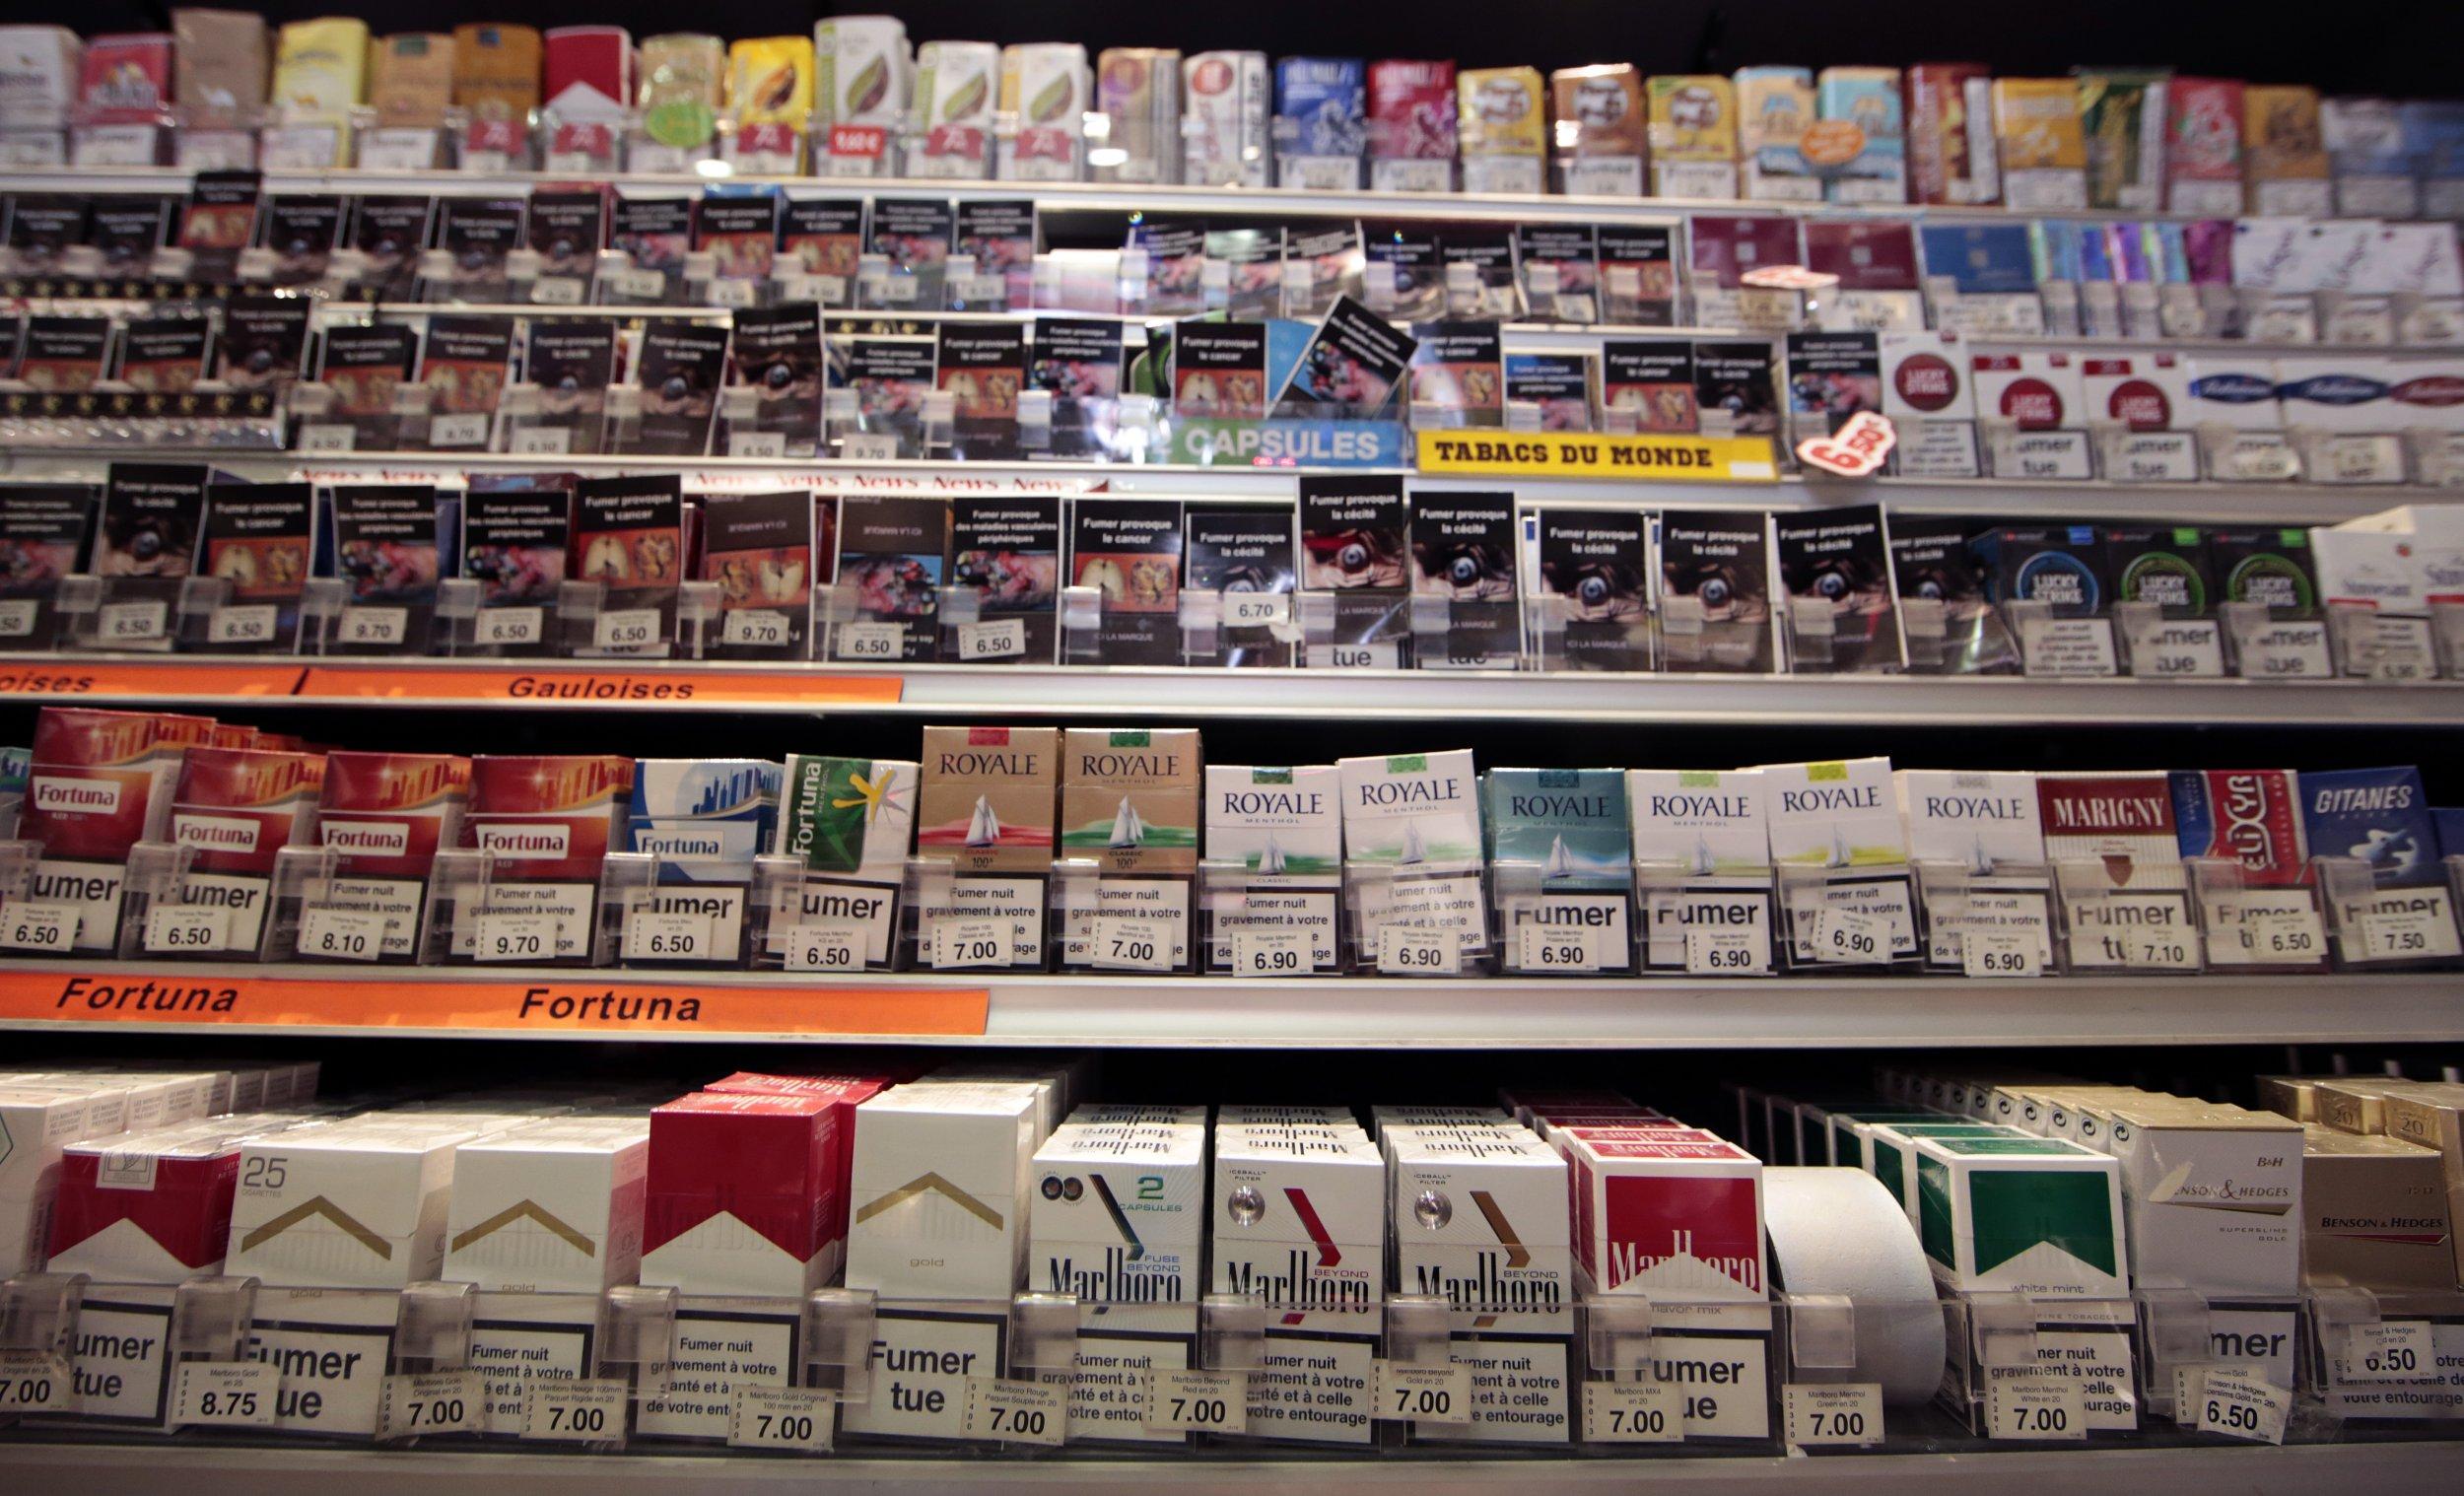 10_06_cigarette_packaging_01